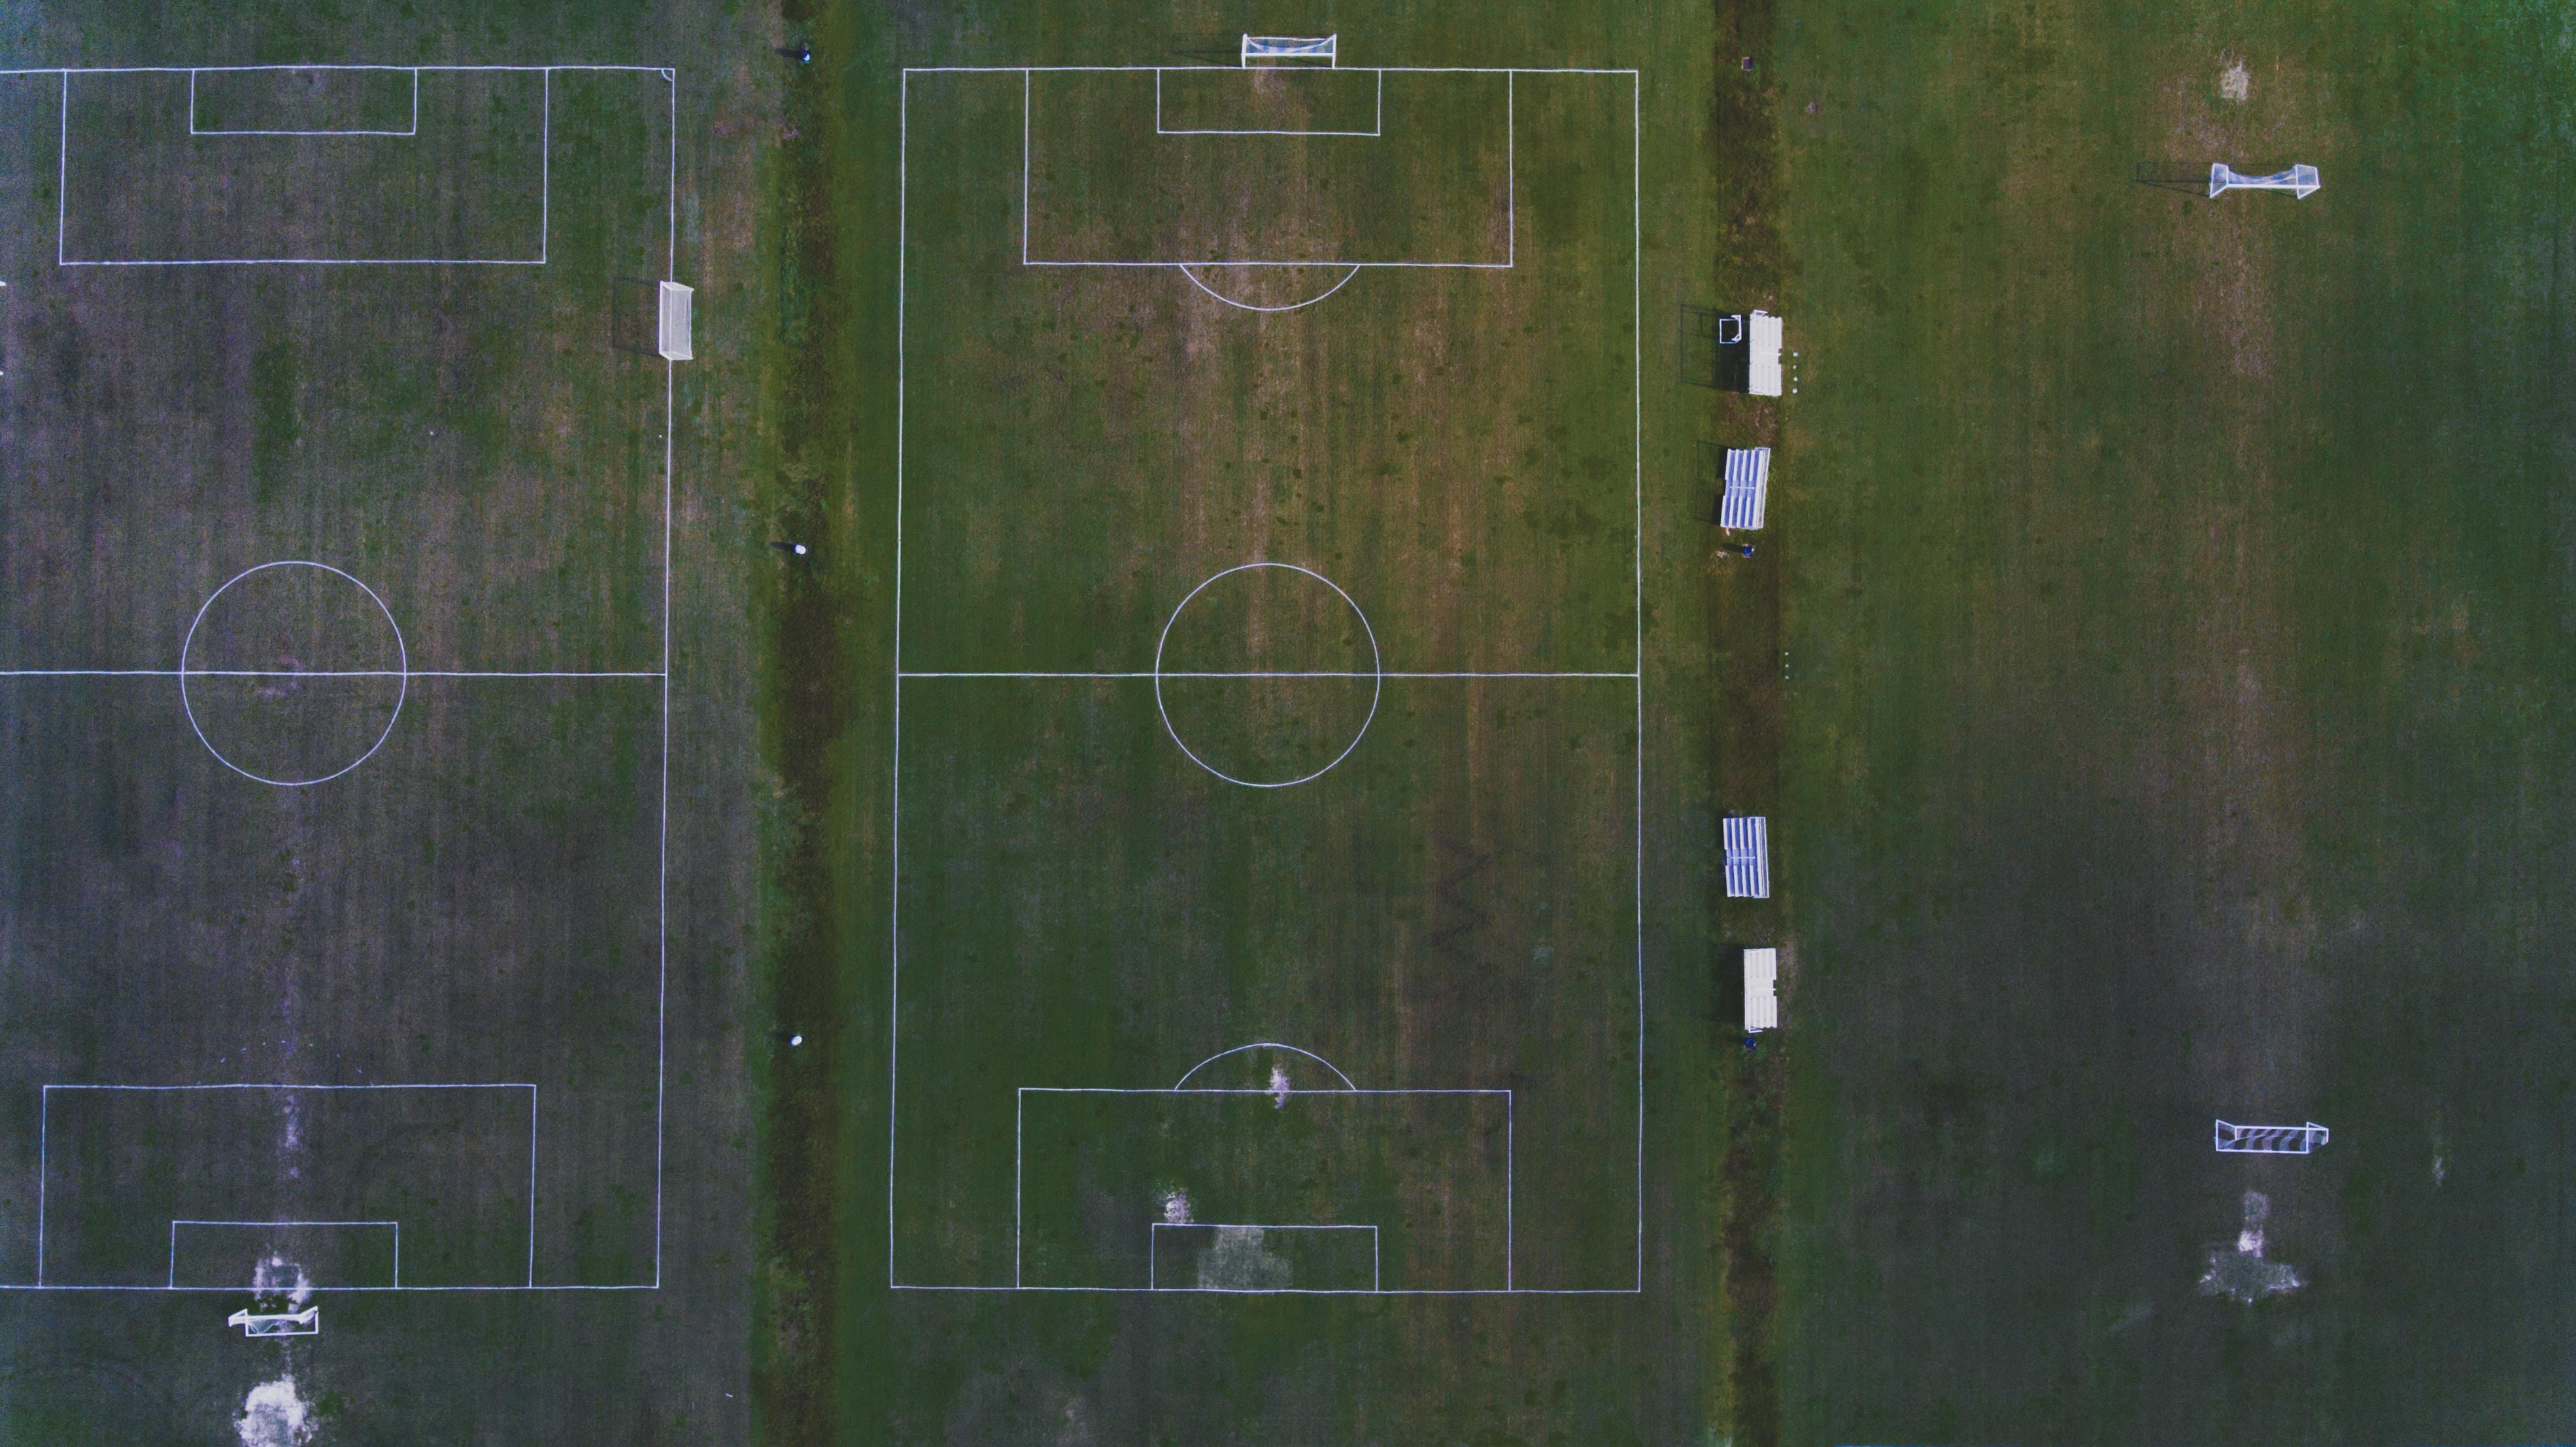 birds eye photography of two soccer fields